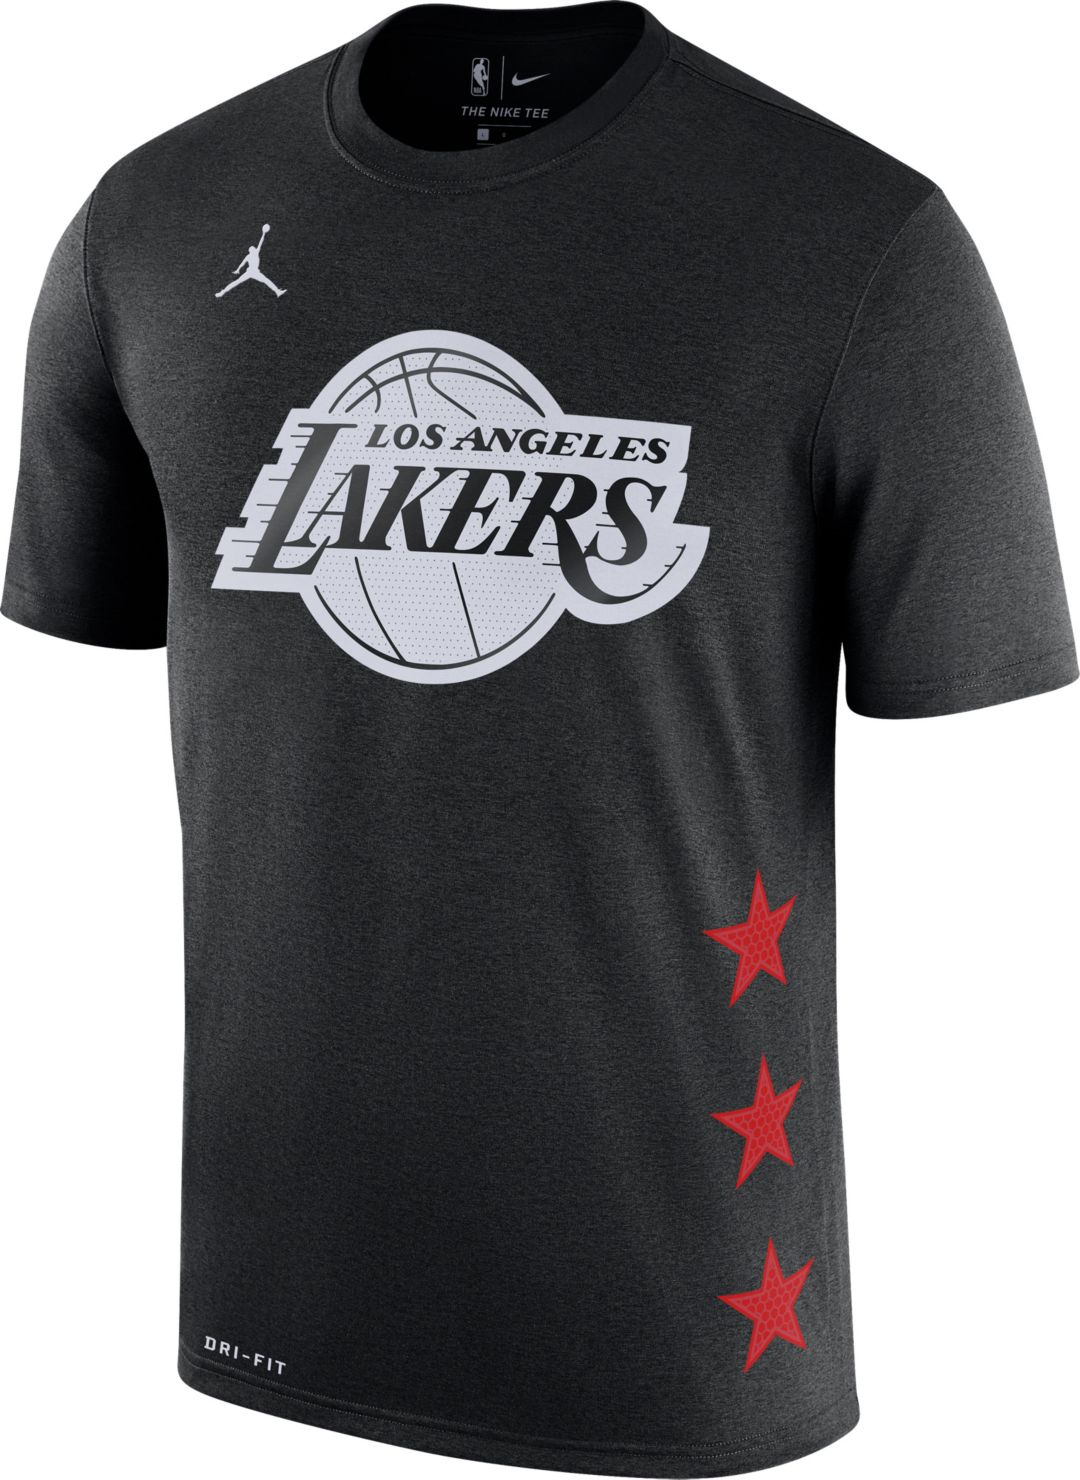 30e2c5a769a Jordan Youth 2019 NBA All-Star Game LeBron James Dri-FIT Black T ...